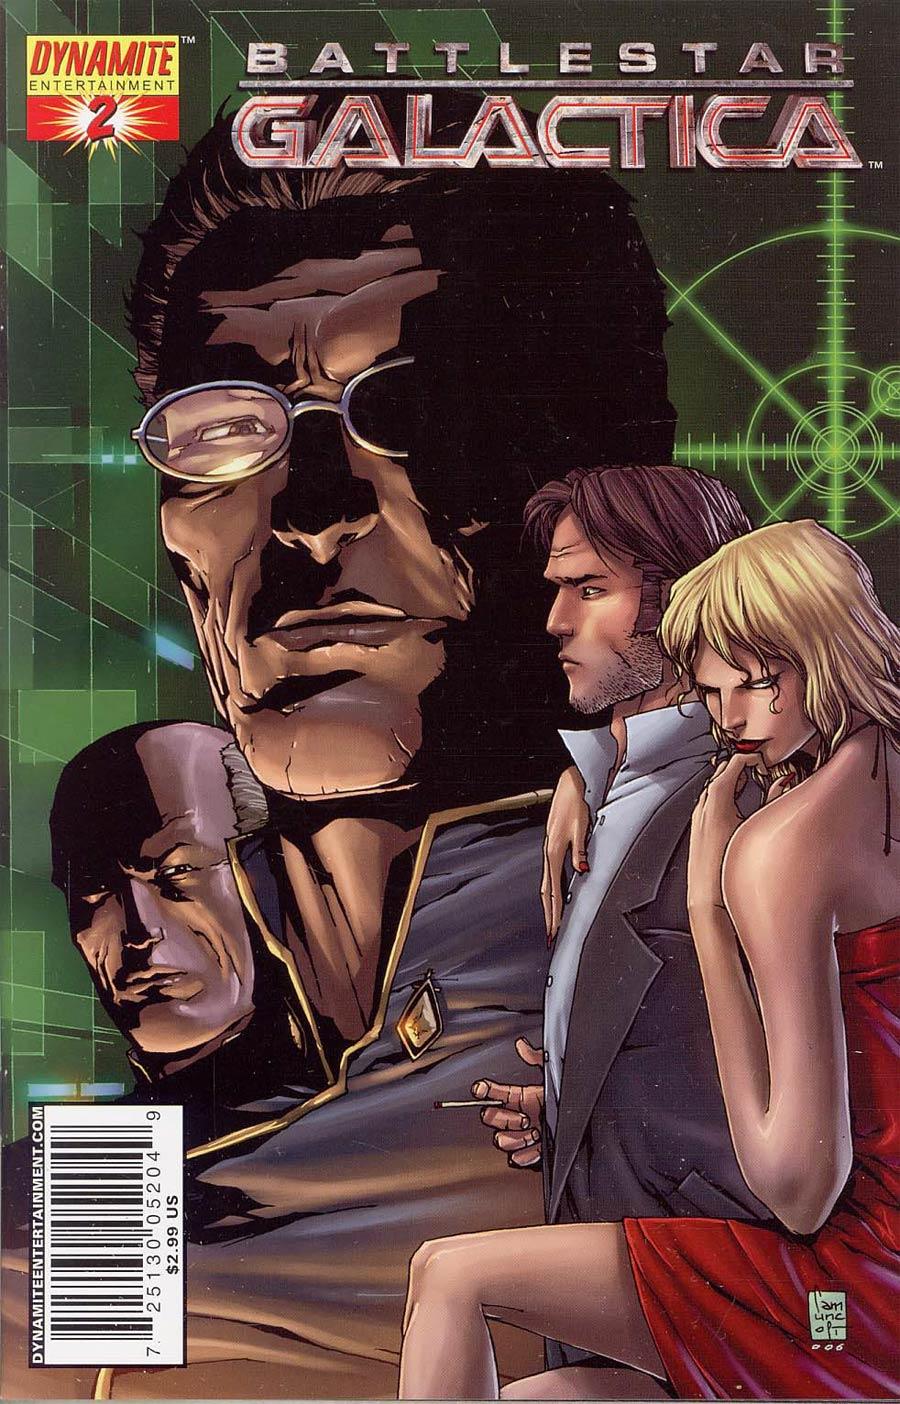 Battlestar Galactica Vol 4 #2 Cover C Camuncoli